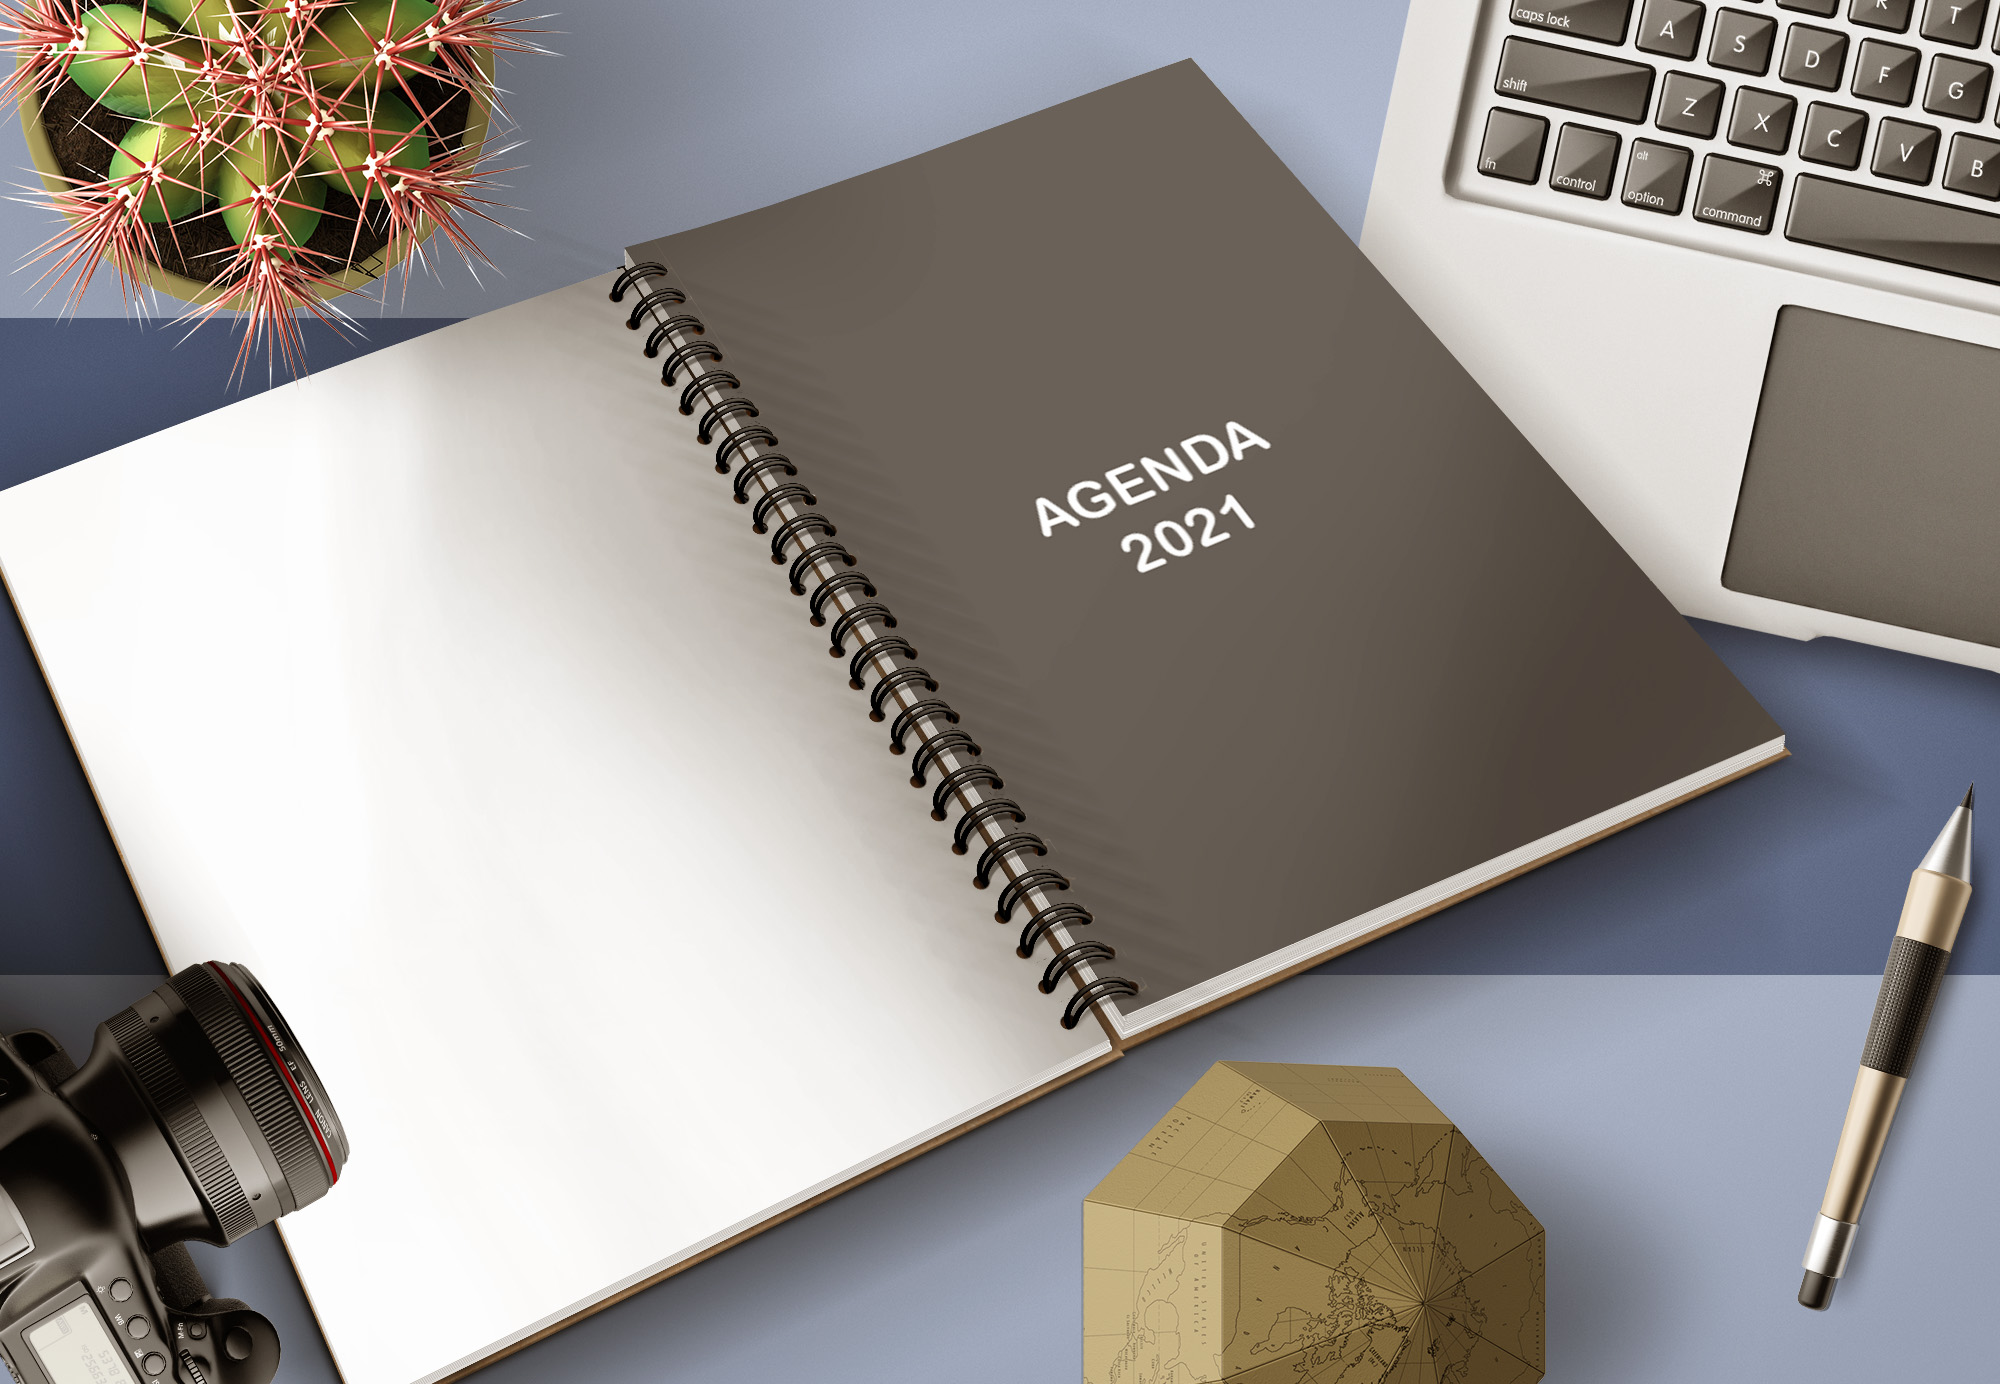 Miolo De Agenda Semanal 2021 Para Imprimir Modelo De Agenda